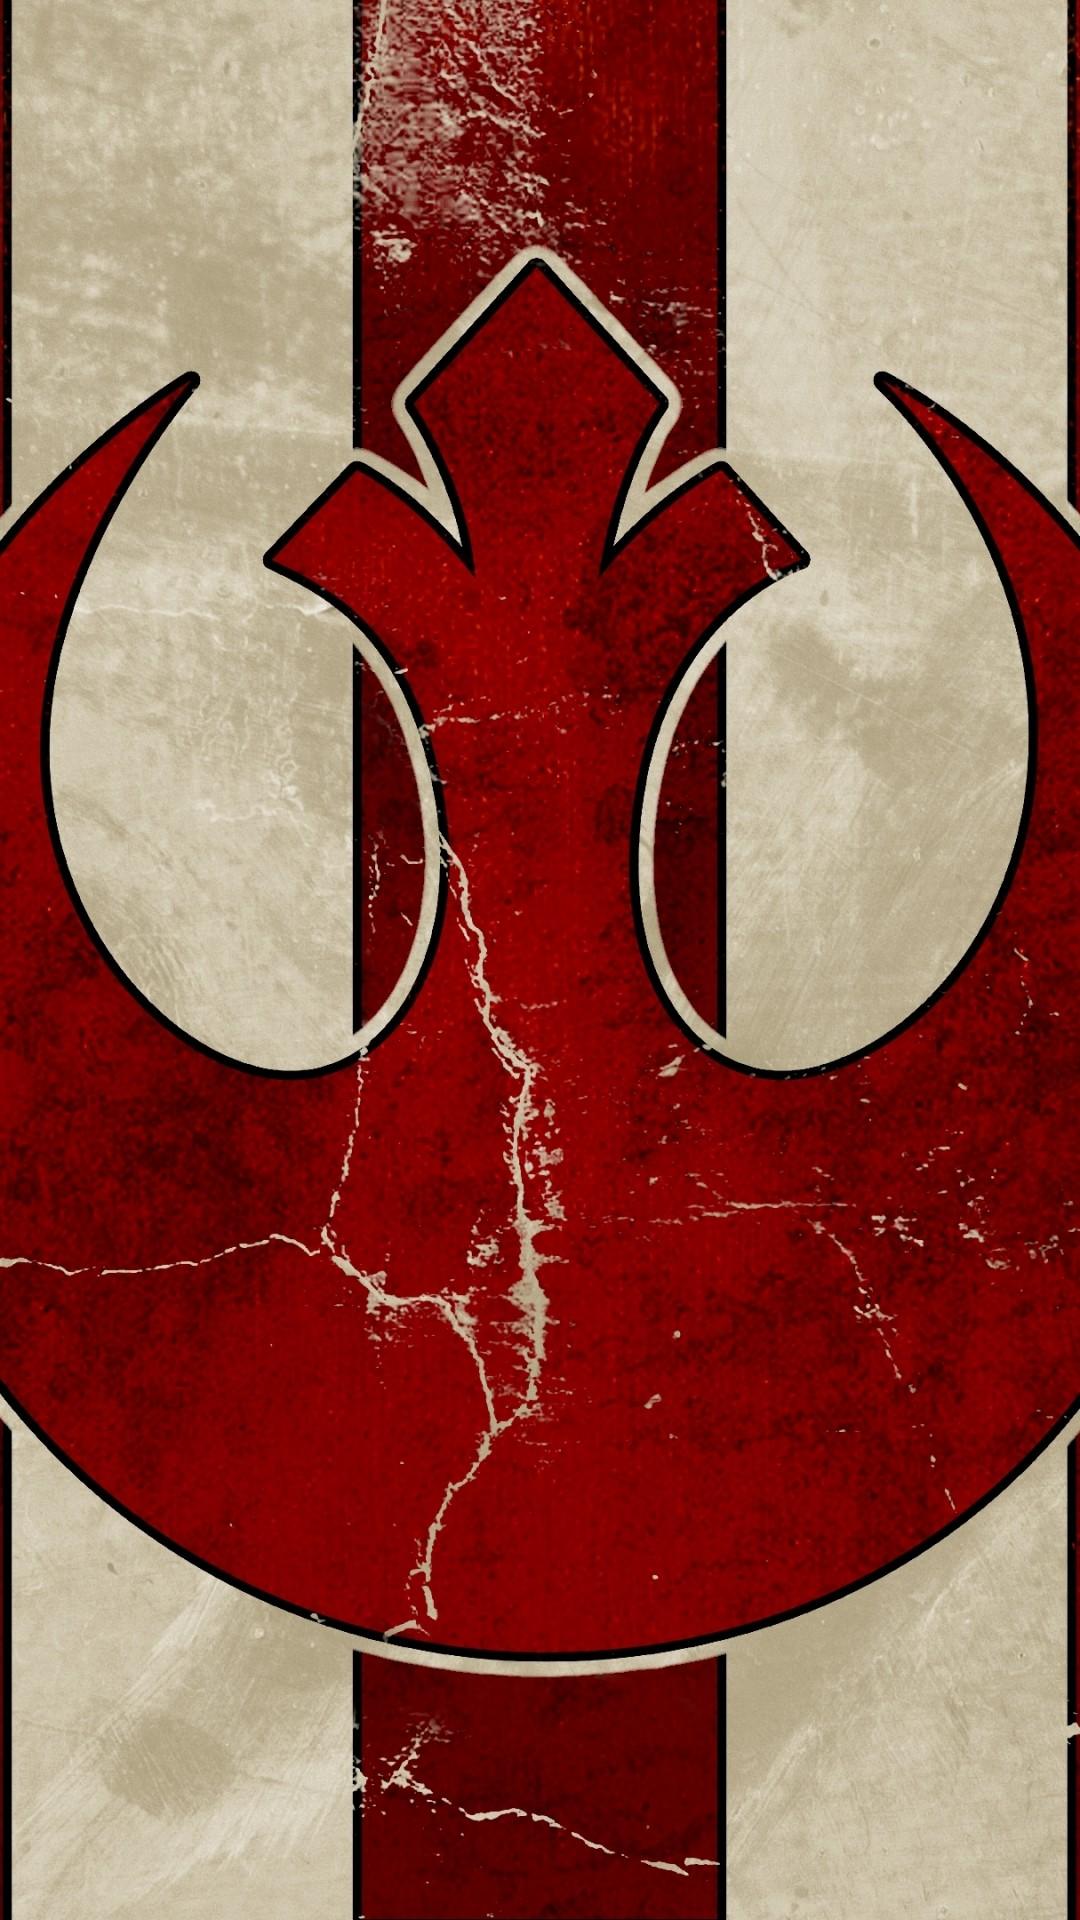 Star Wars Phone Wallpaper Download Free Wallpapers For Desktop